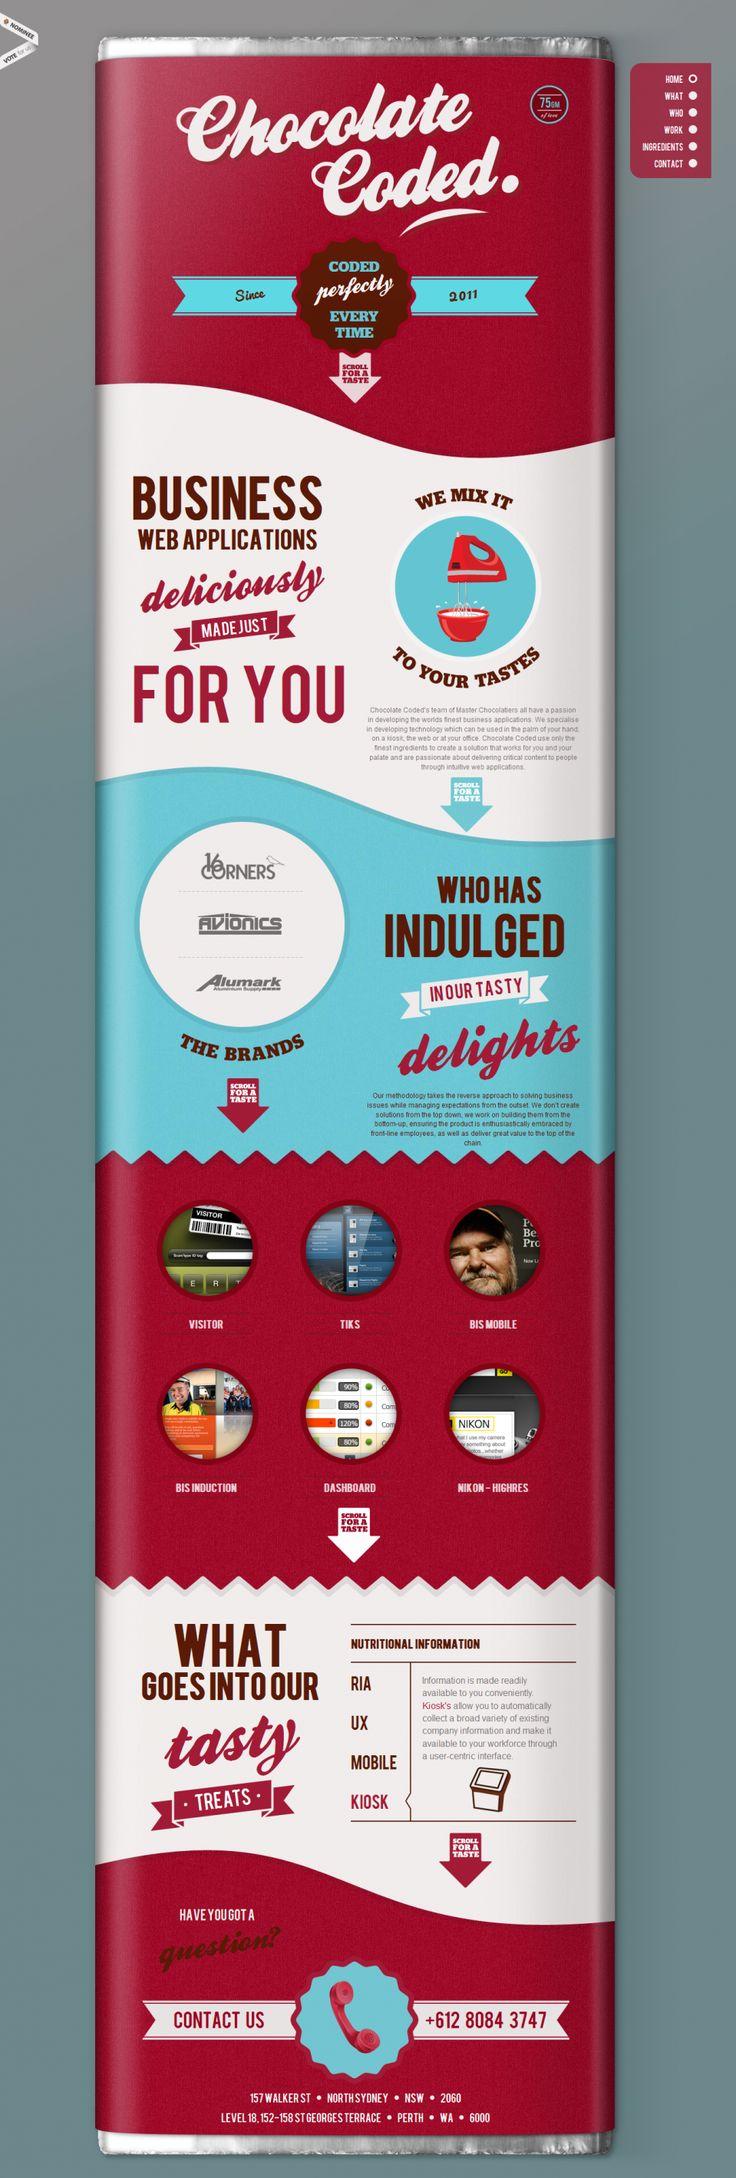 Unique Web Design, Chocolate Coded #webdesign #design (http://www.pinterest.com/aldenchong/)